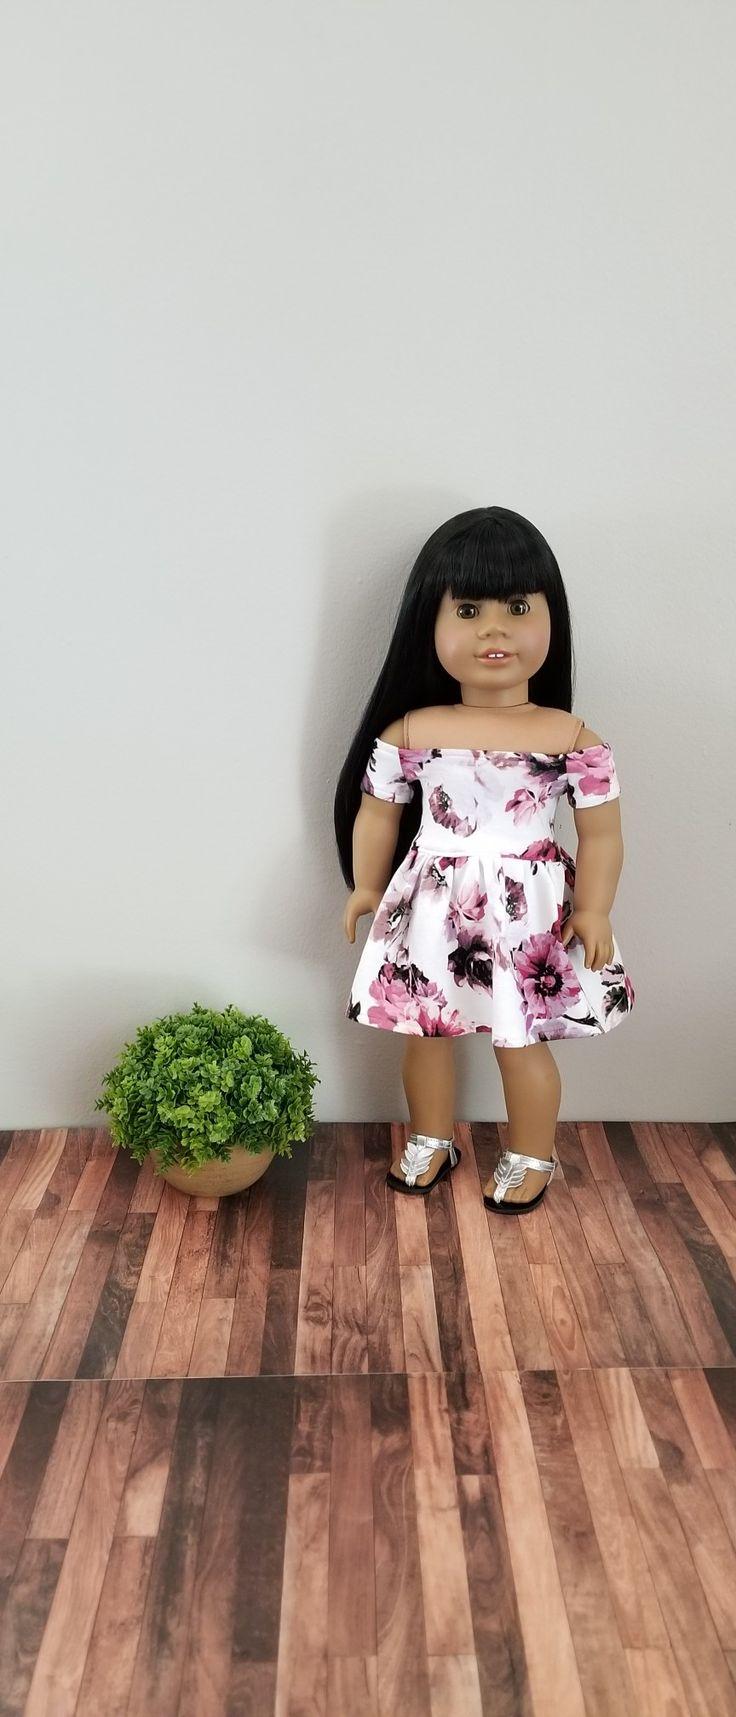 5059 best American Girl Dolls images on Pinterest | Puppenzubehör ...